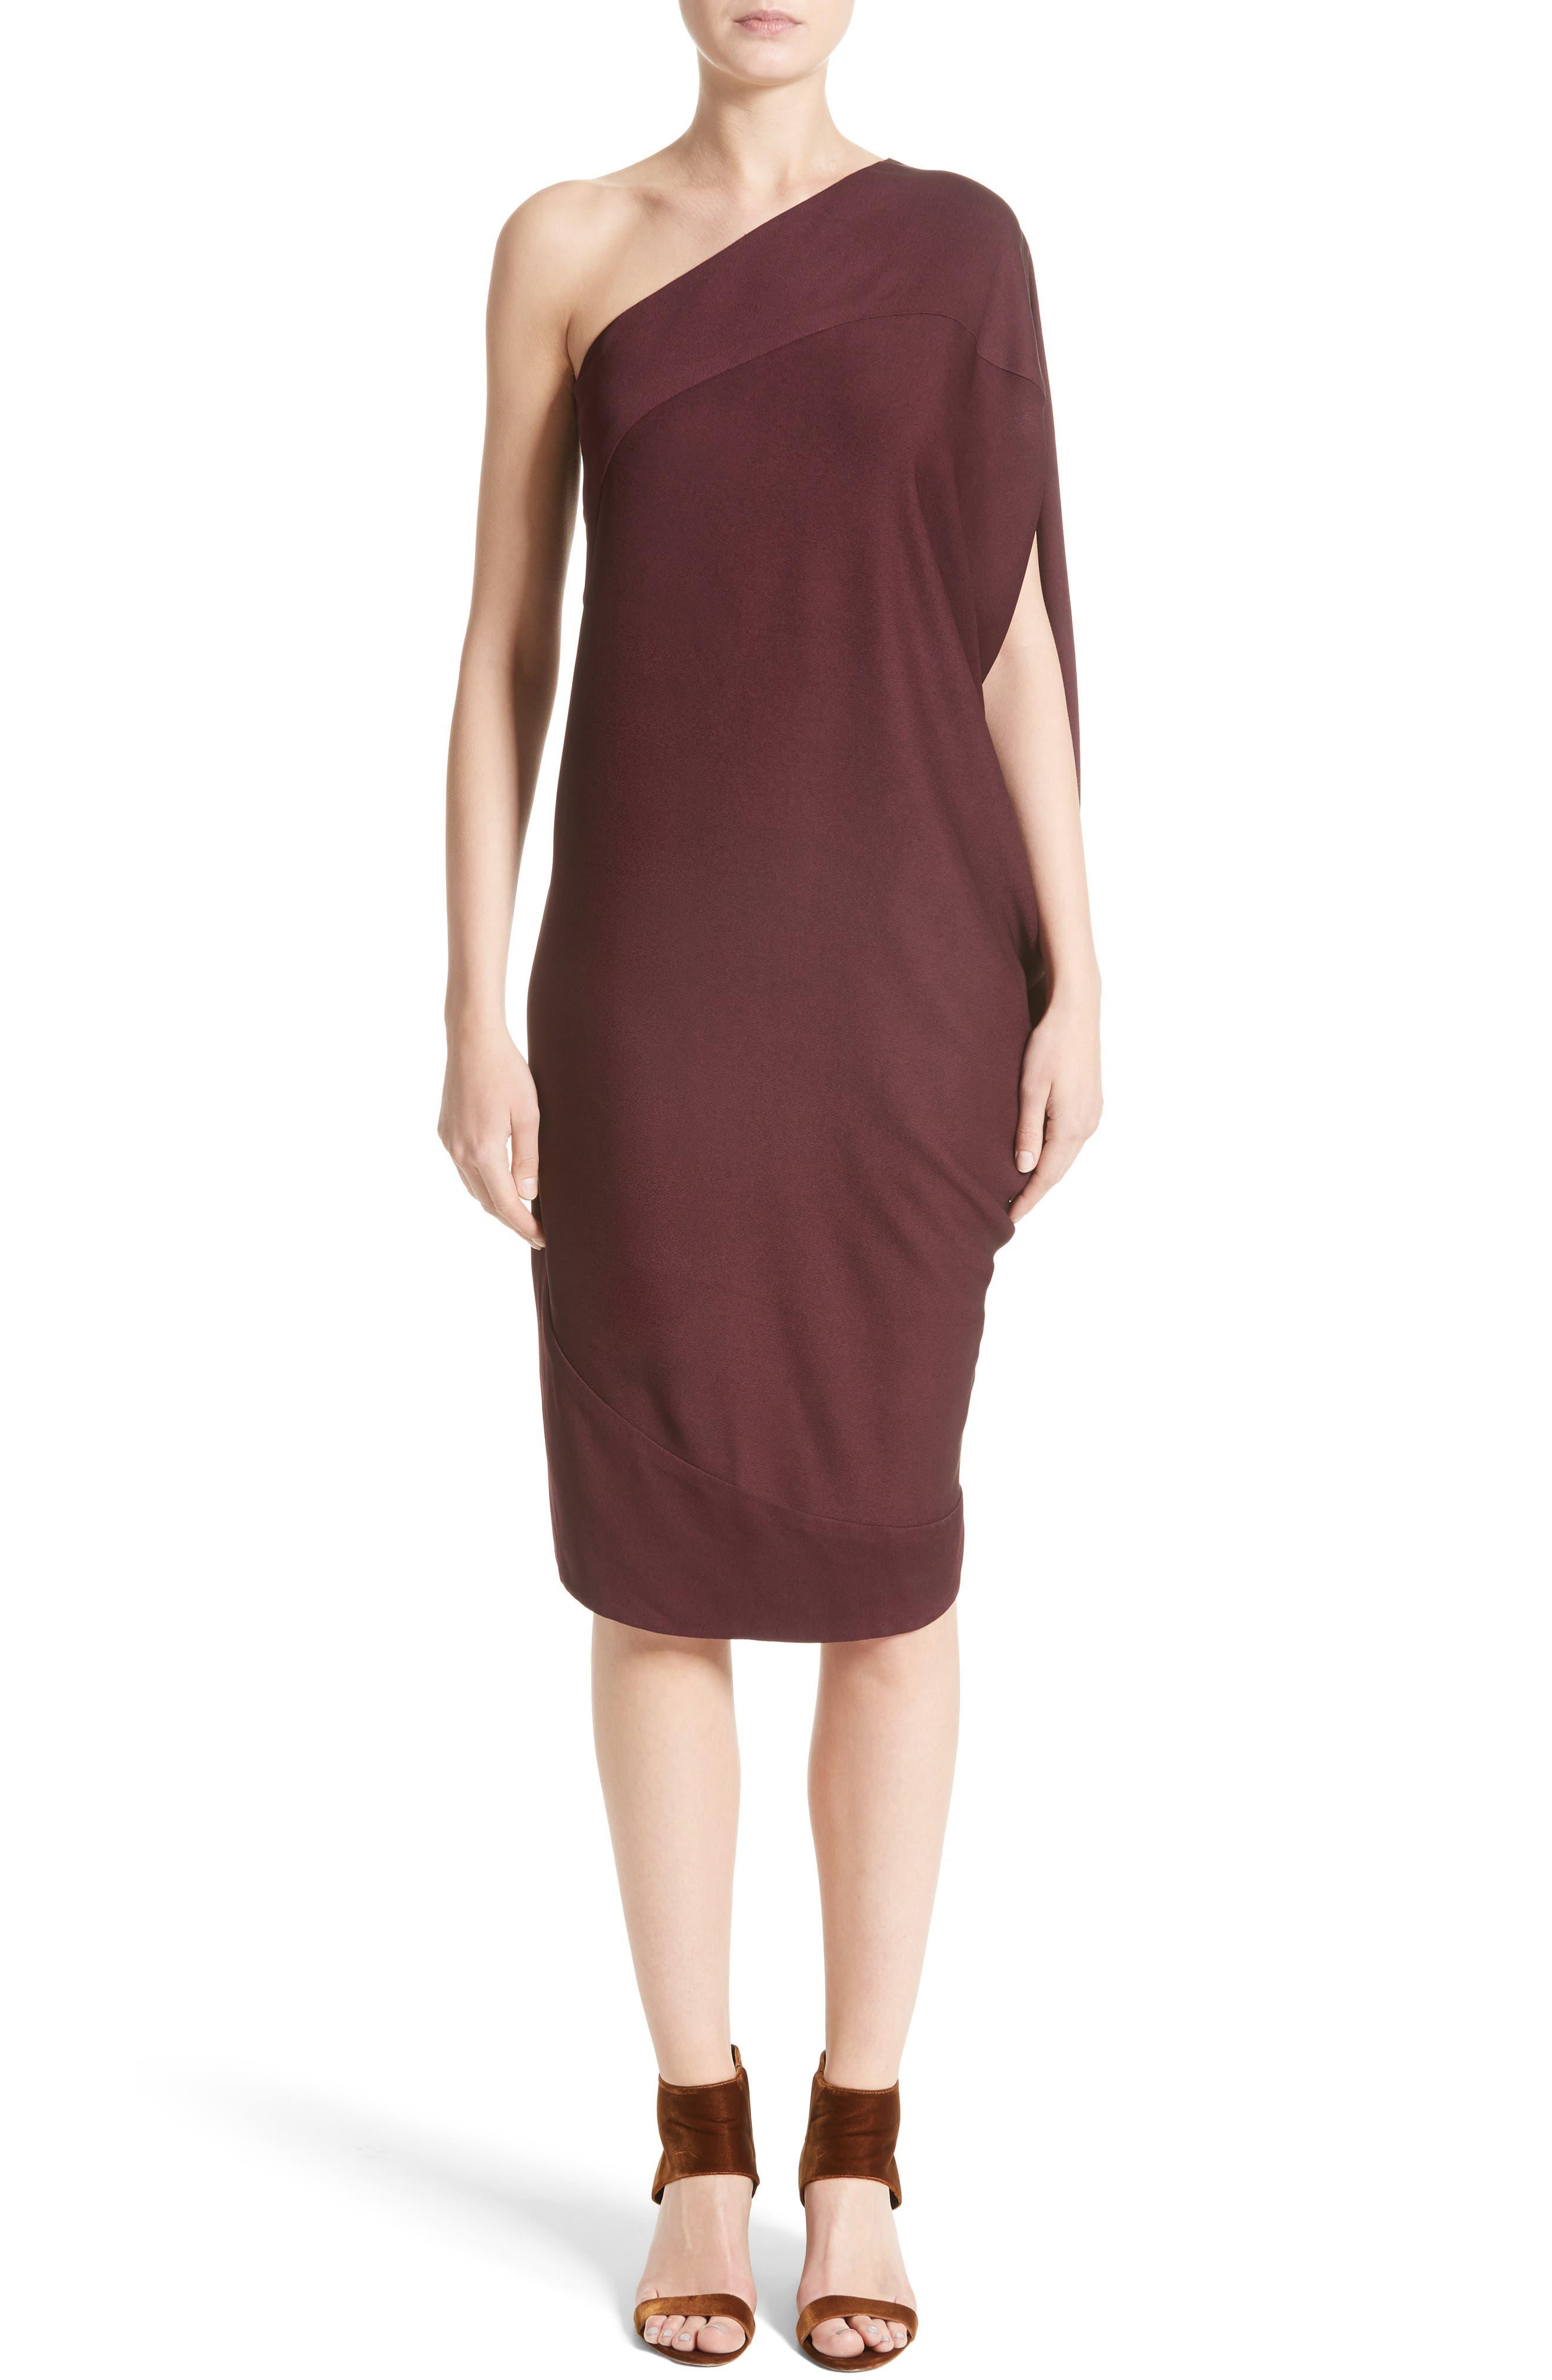 Main Image - Zero + Maria Cornejo Lui Eco Drape One-Shoulder Dress